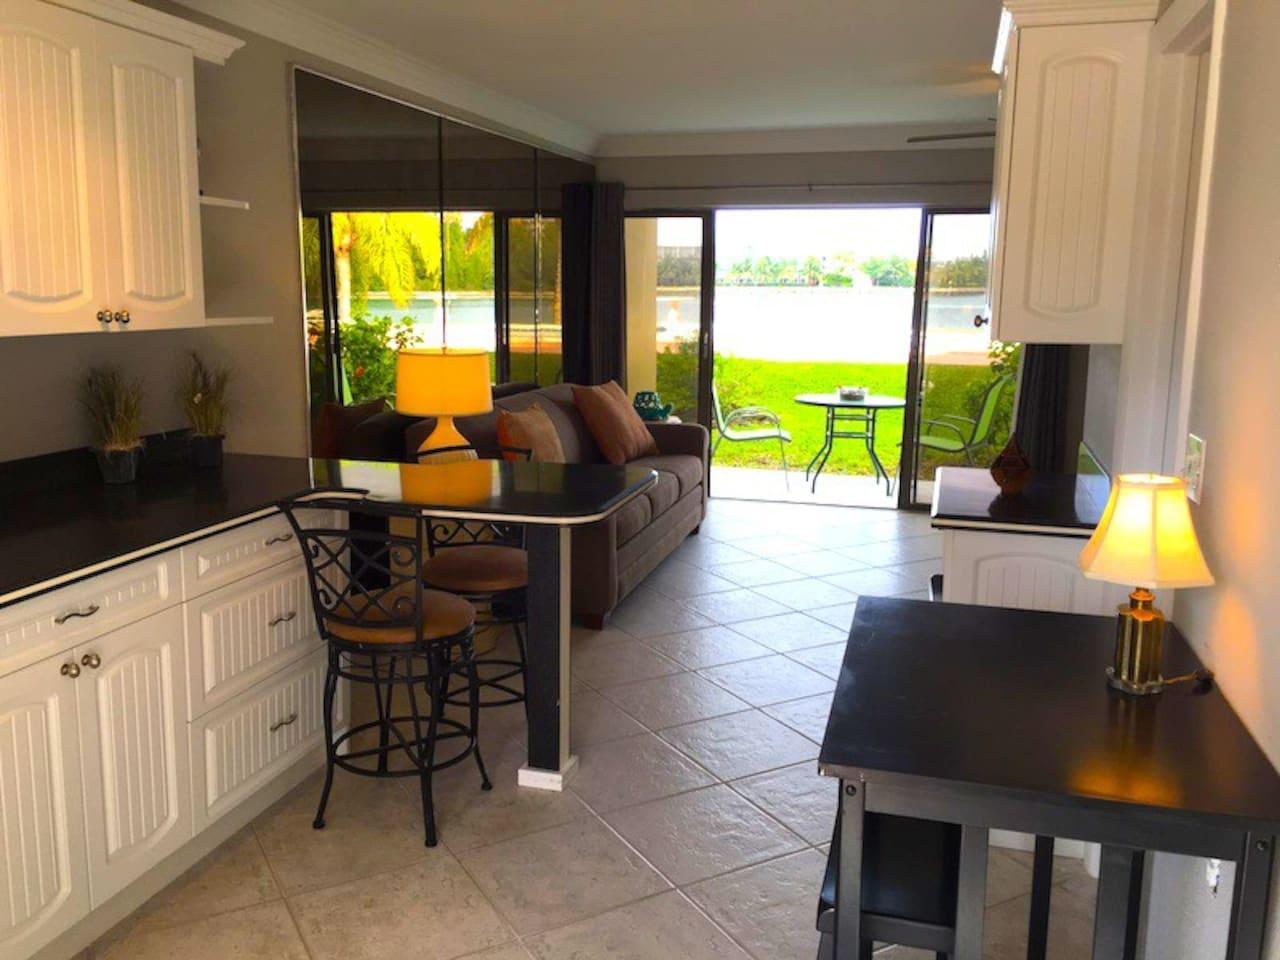 New kitchen/appliances